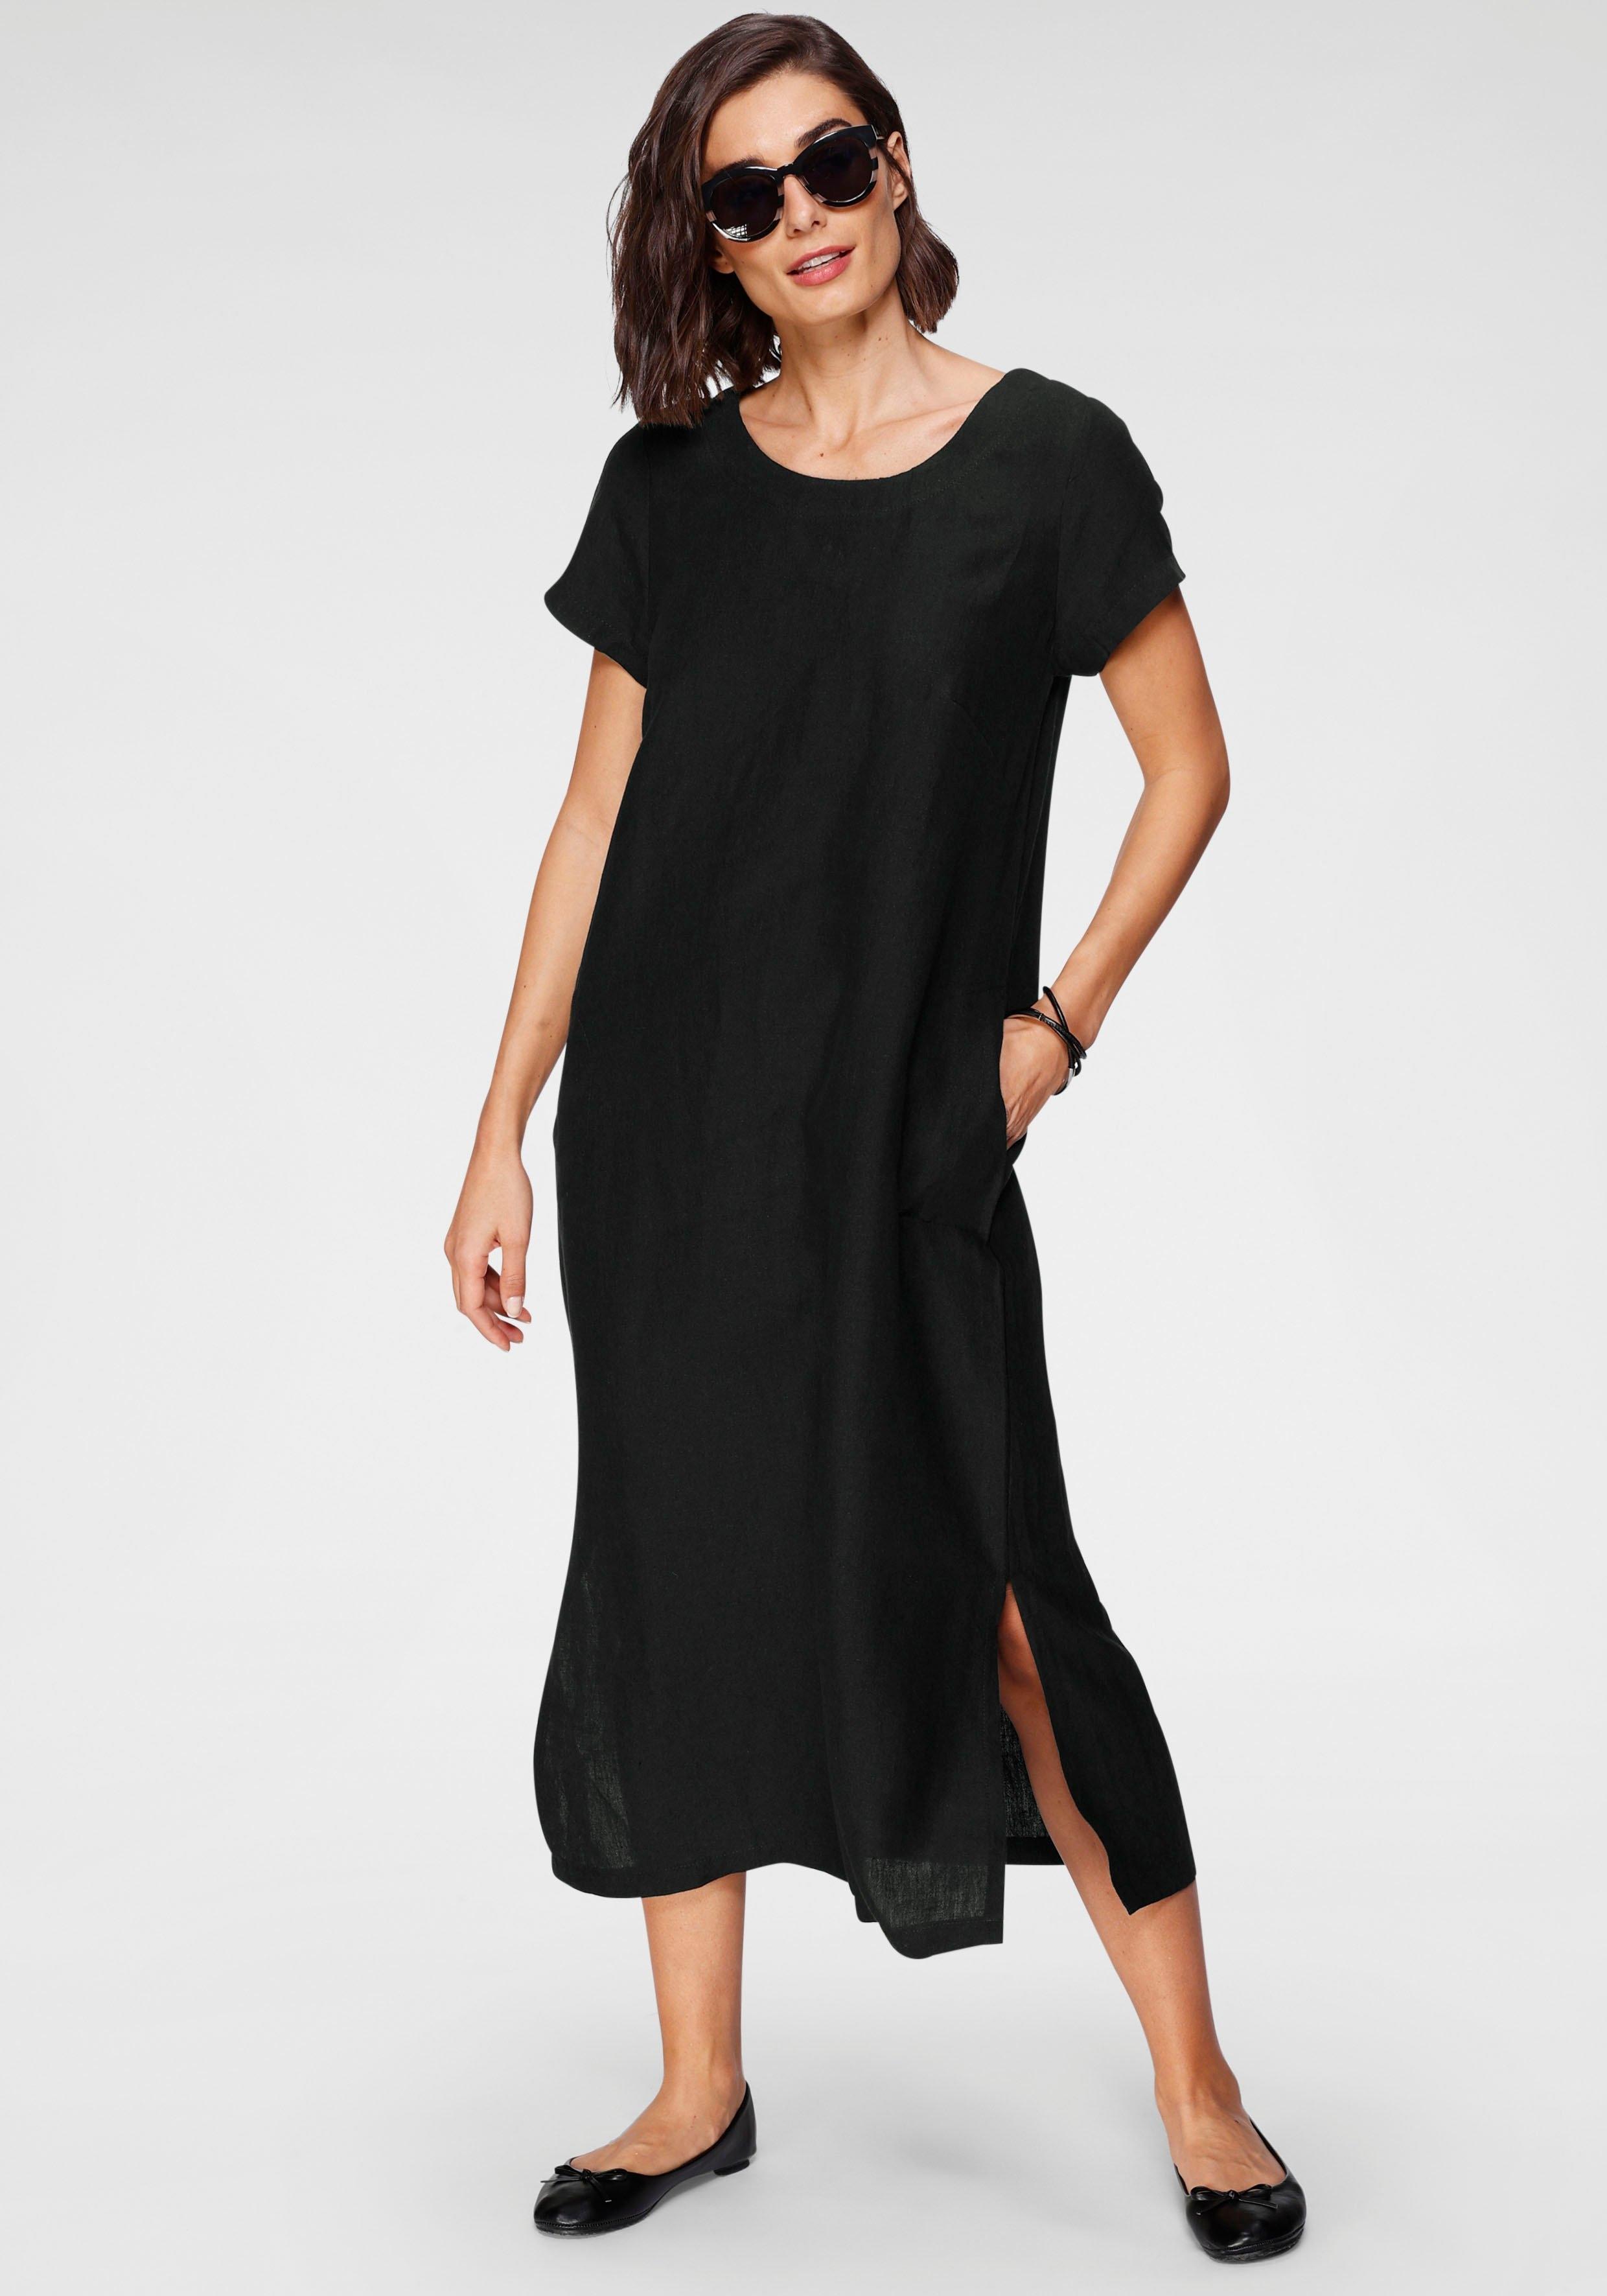 SAMMER Berlin zomerjurk linnen jurk, korte mouwen nu online bestellen